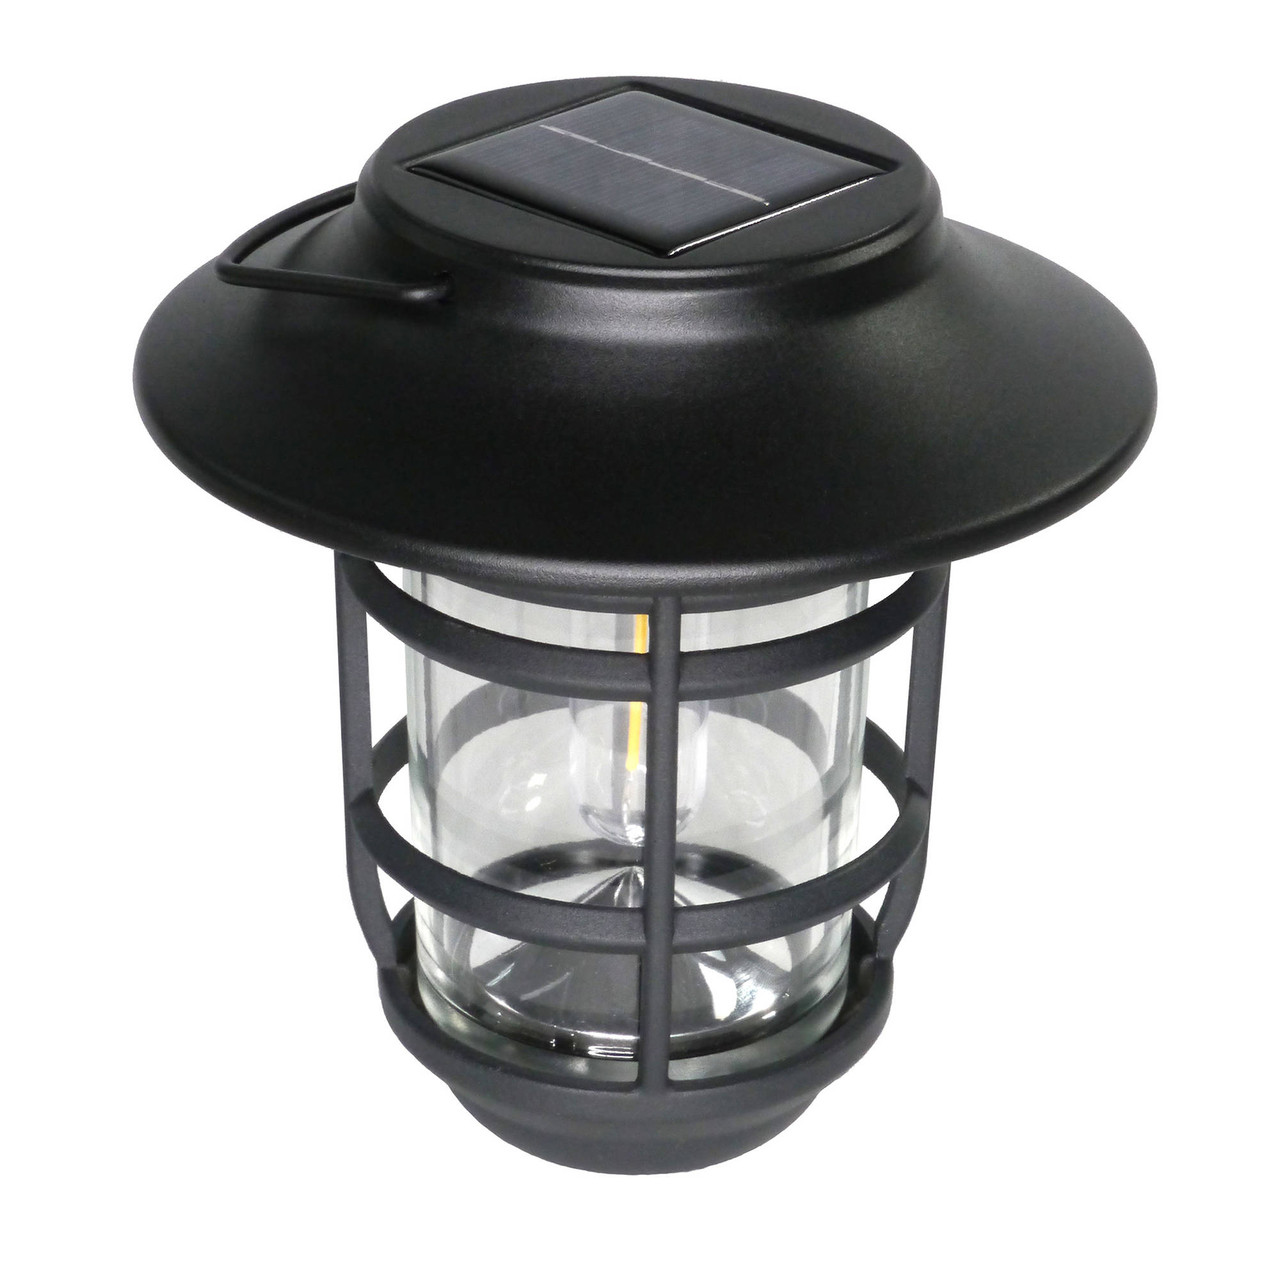 Nottingham Black Aluminum Solar Hanging Coach Light from Classy Caps (SHW553)